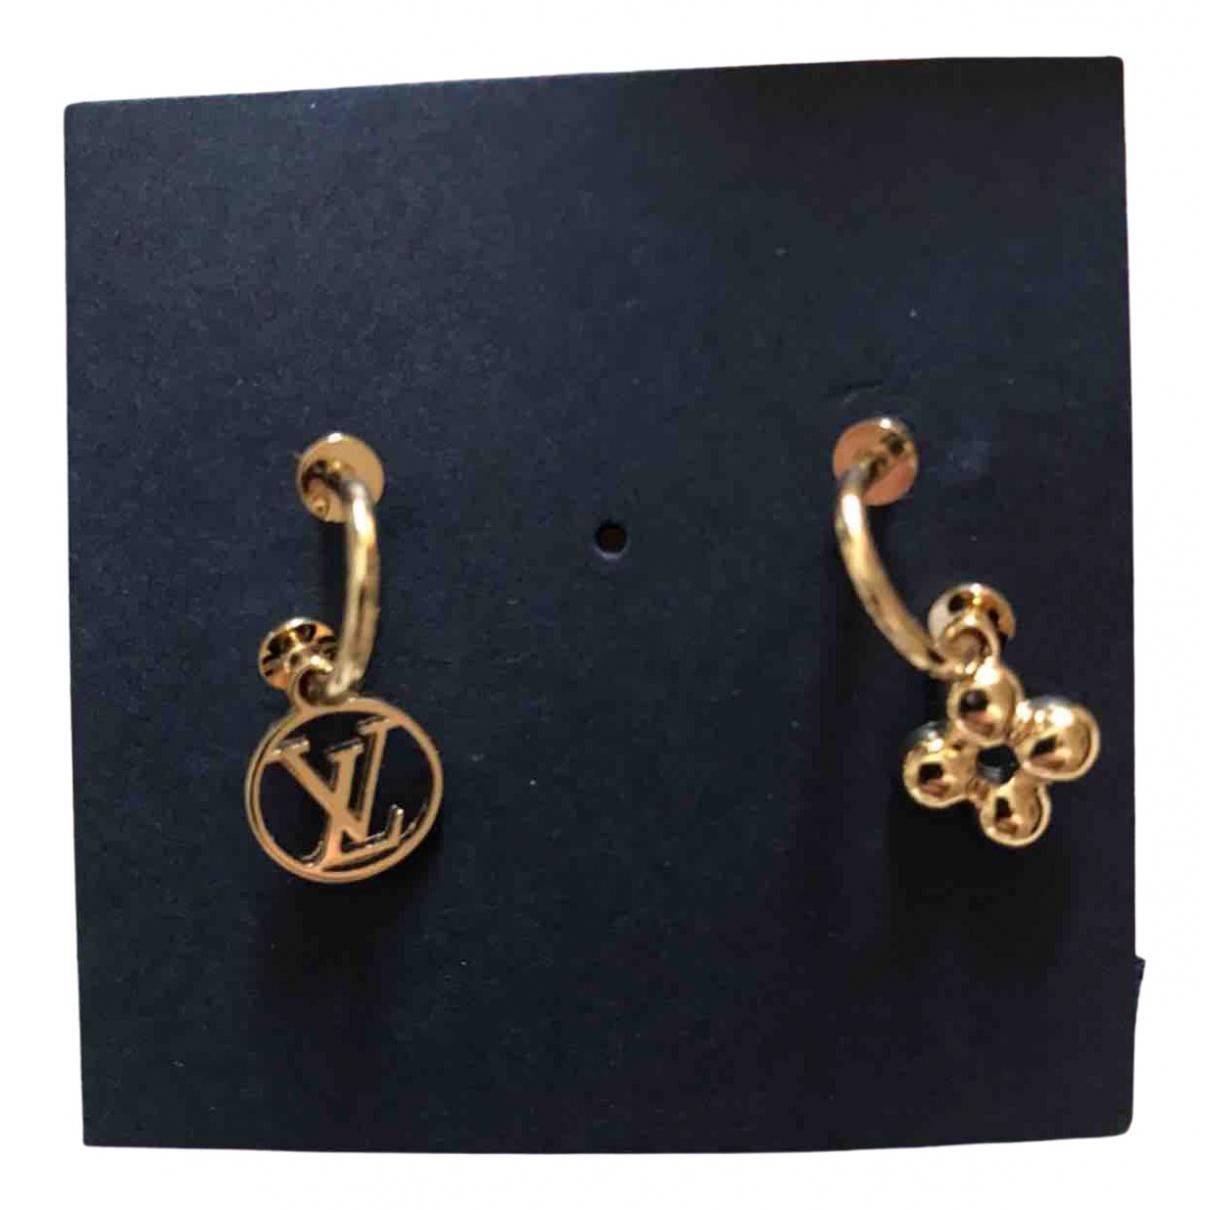 Louis Vuitton Monogram OhrRing in  Gold Metall